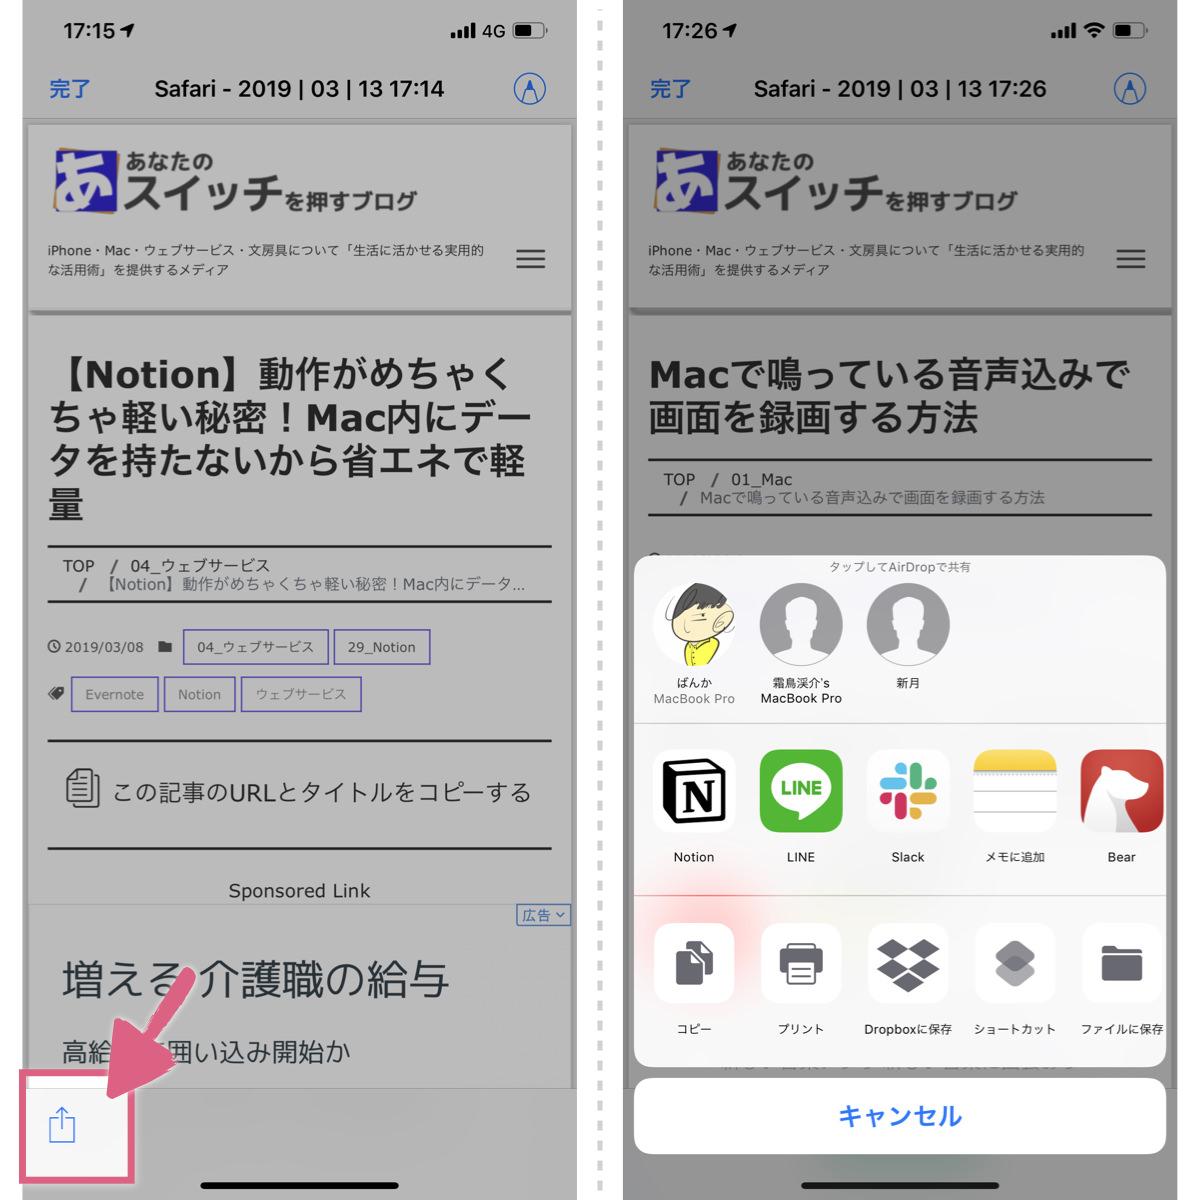 iphone-webpage-captcha_3